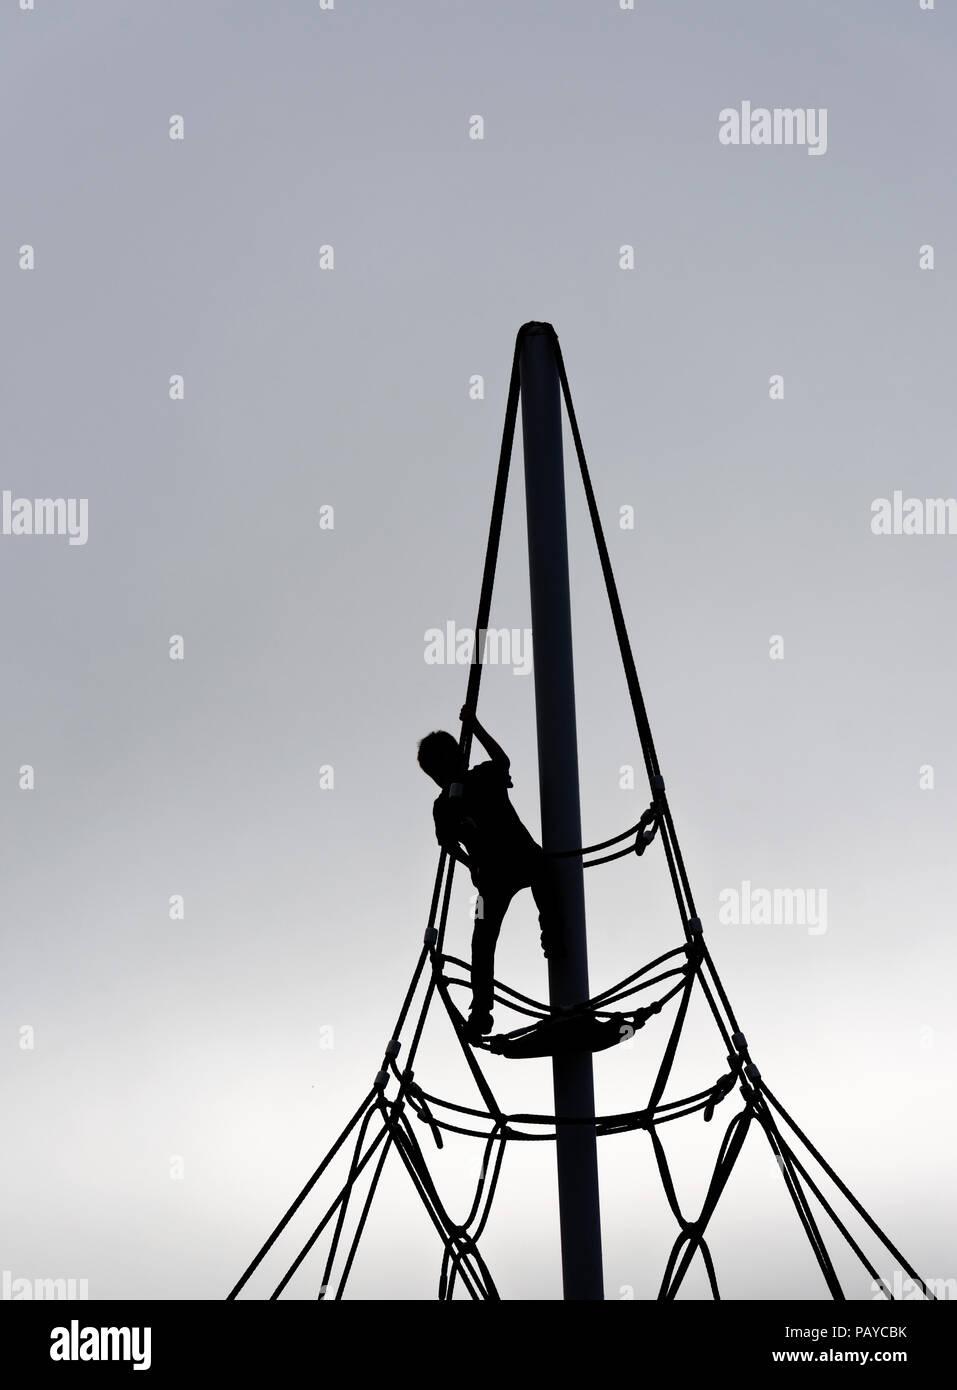 Rope Climbing Frame Stock Photos & Rope Climbing Frame Stock Images ...